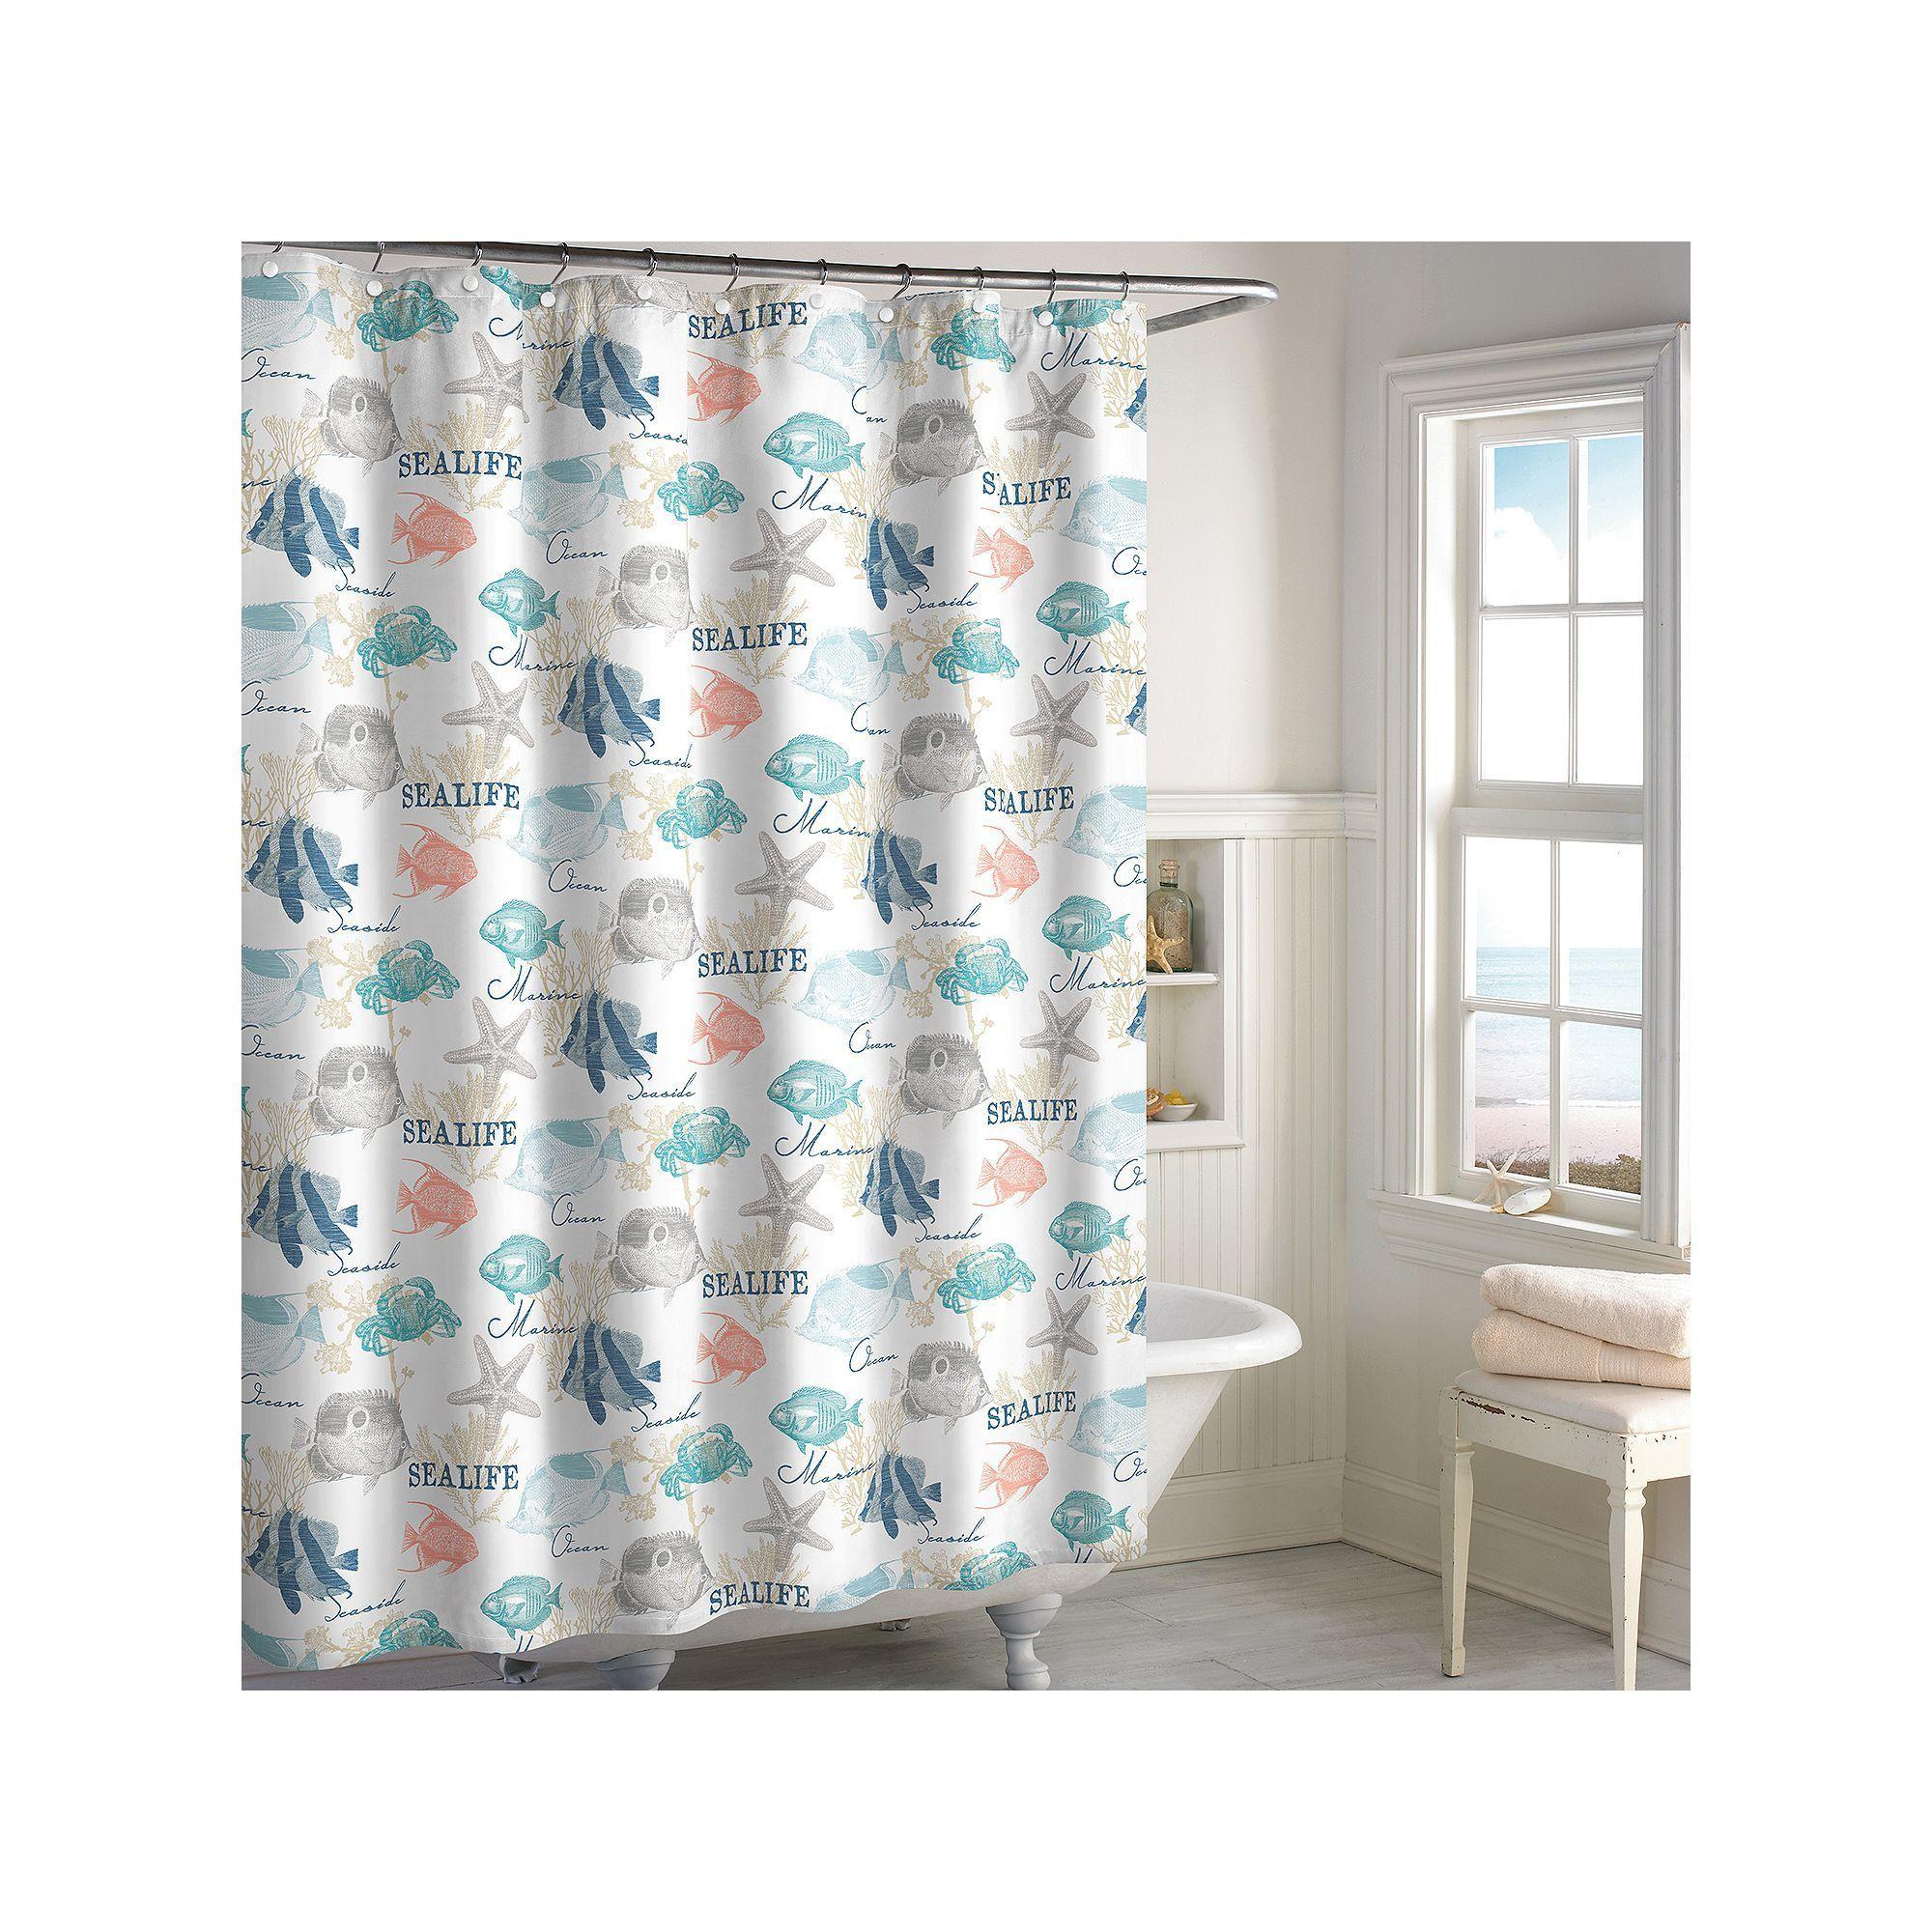 Destinations Seaside Bay Shower Curtain Multicolor Curtains